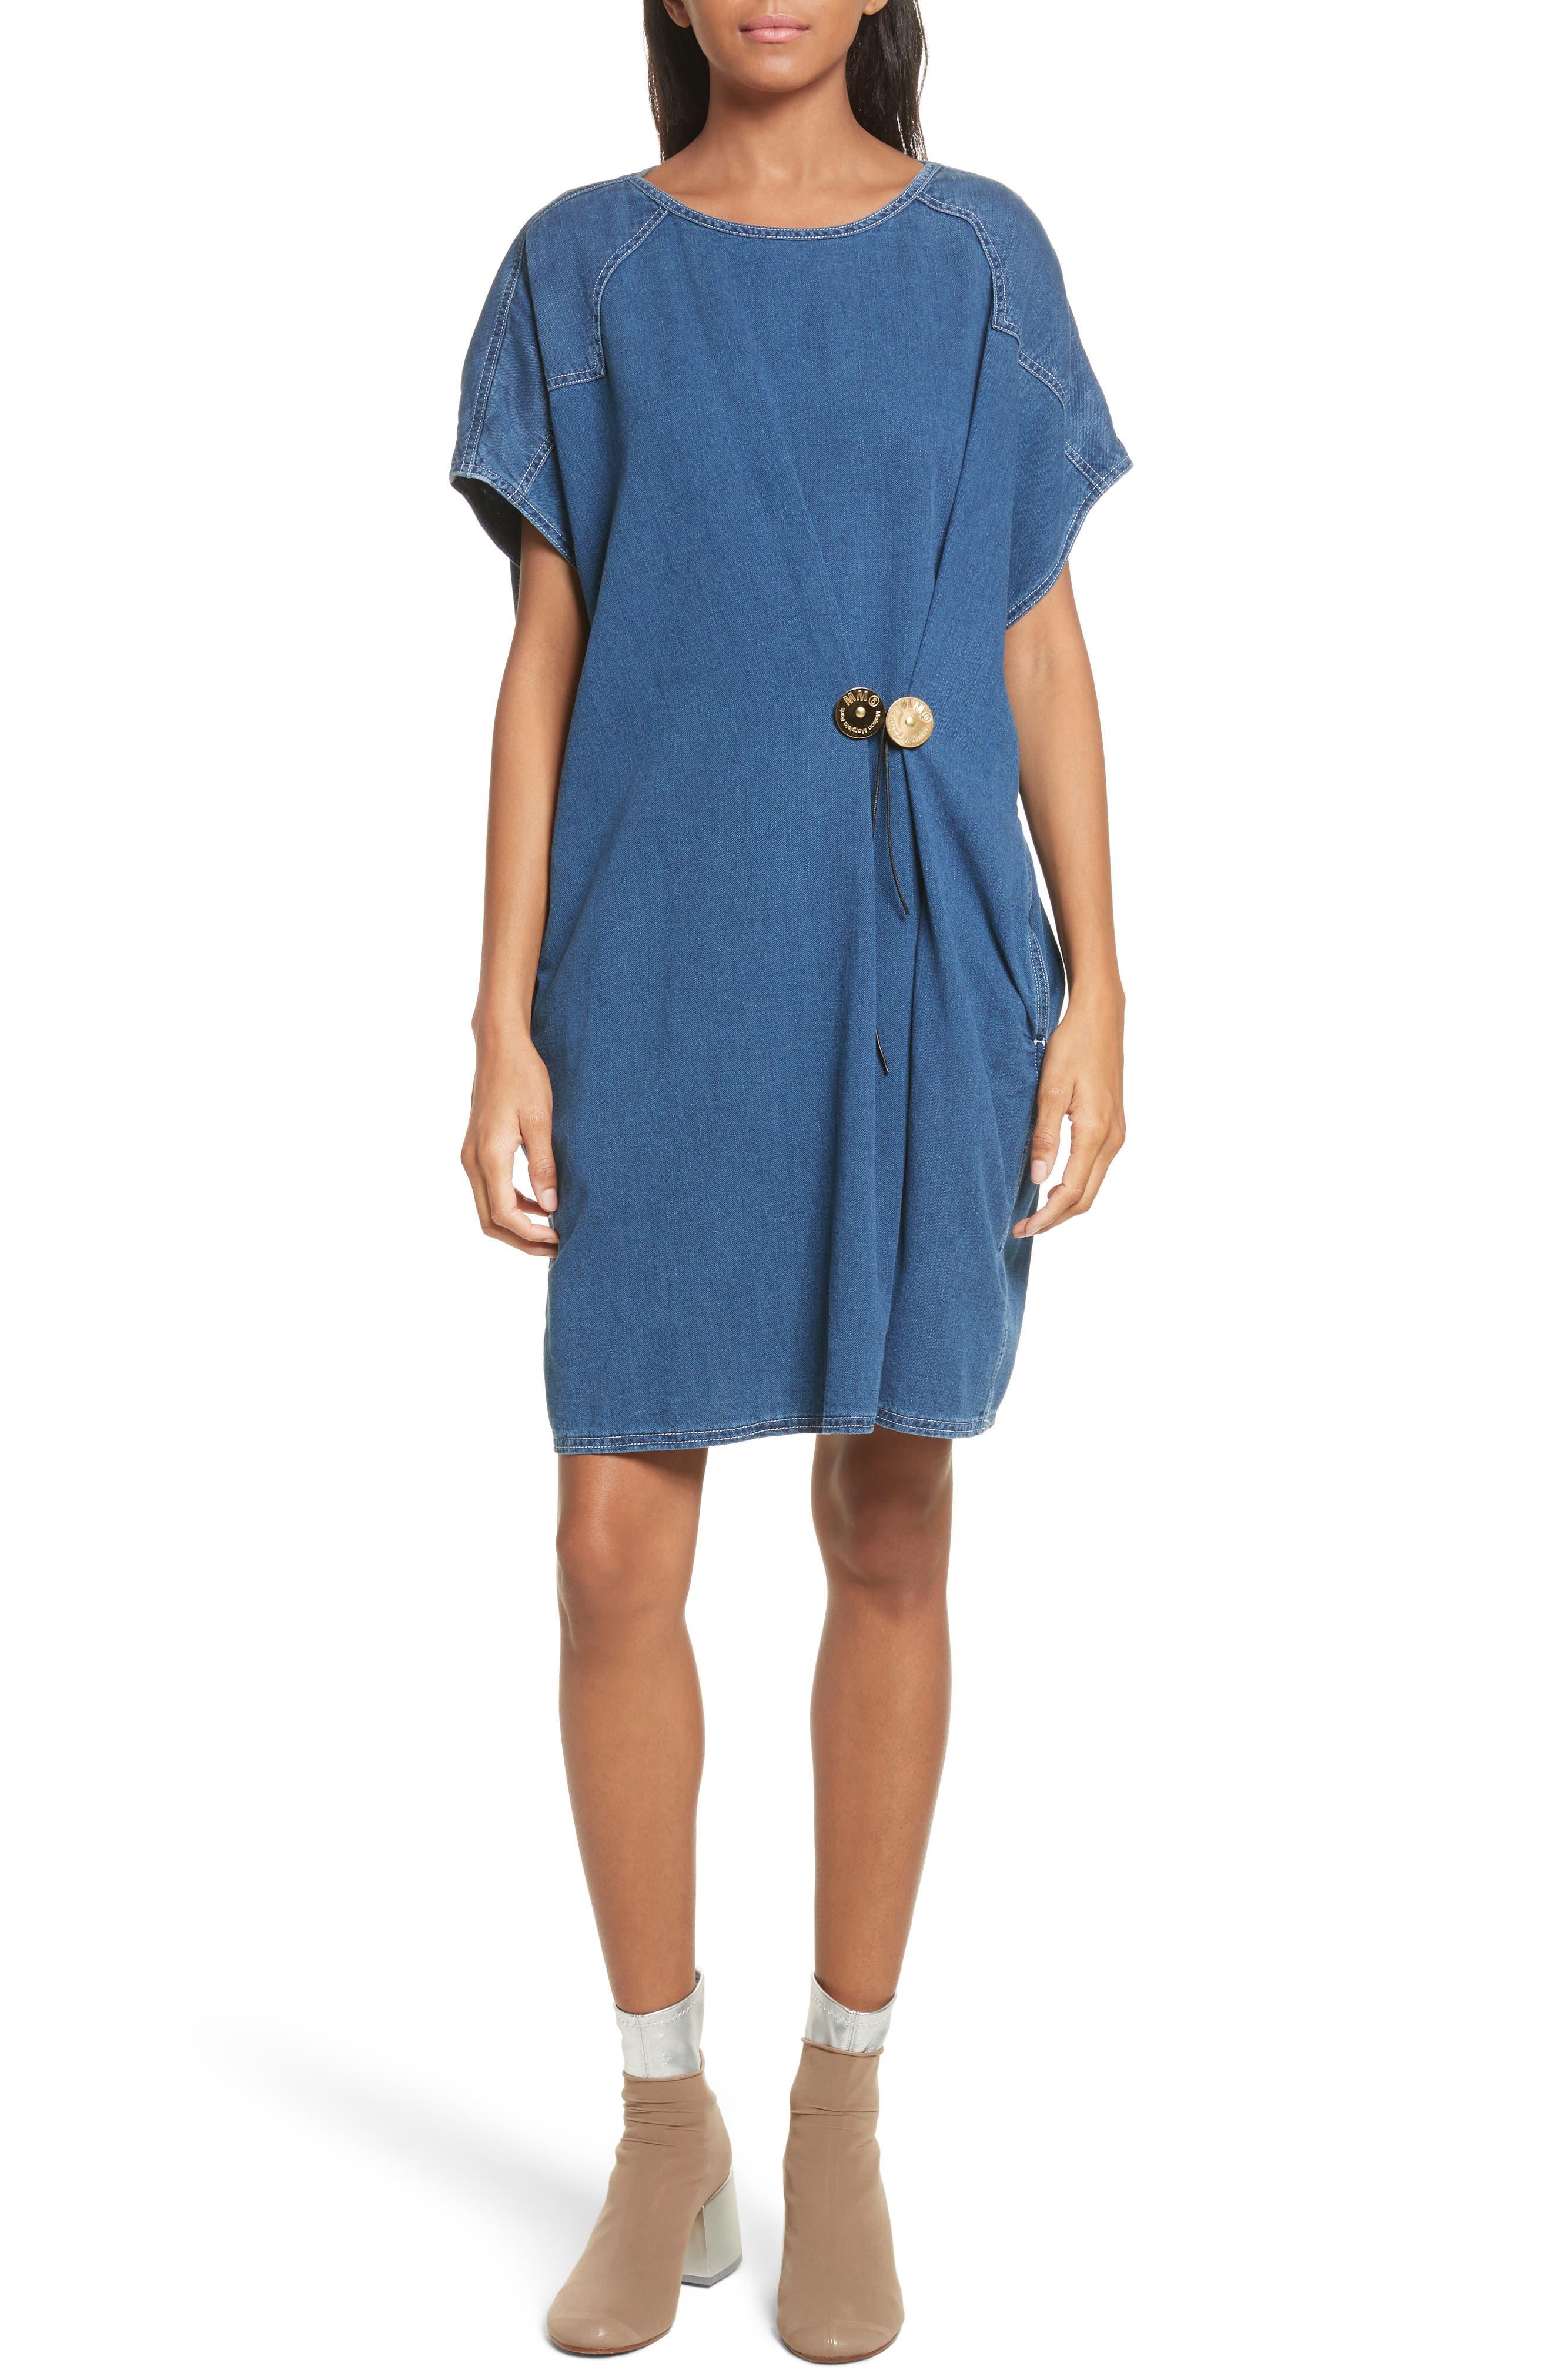 '80s Wash Denim Dress,                             Main thumbnail 1, color,                             Medium Blue